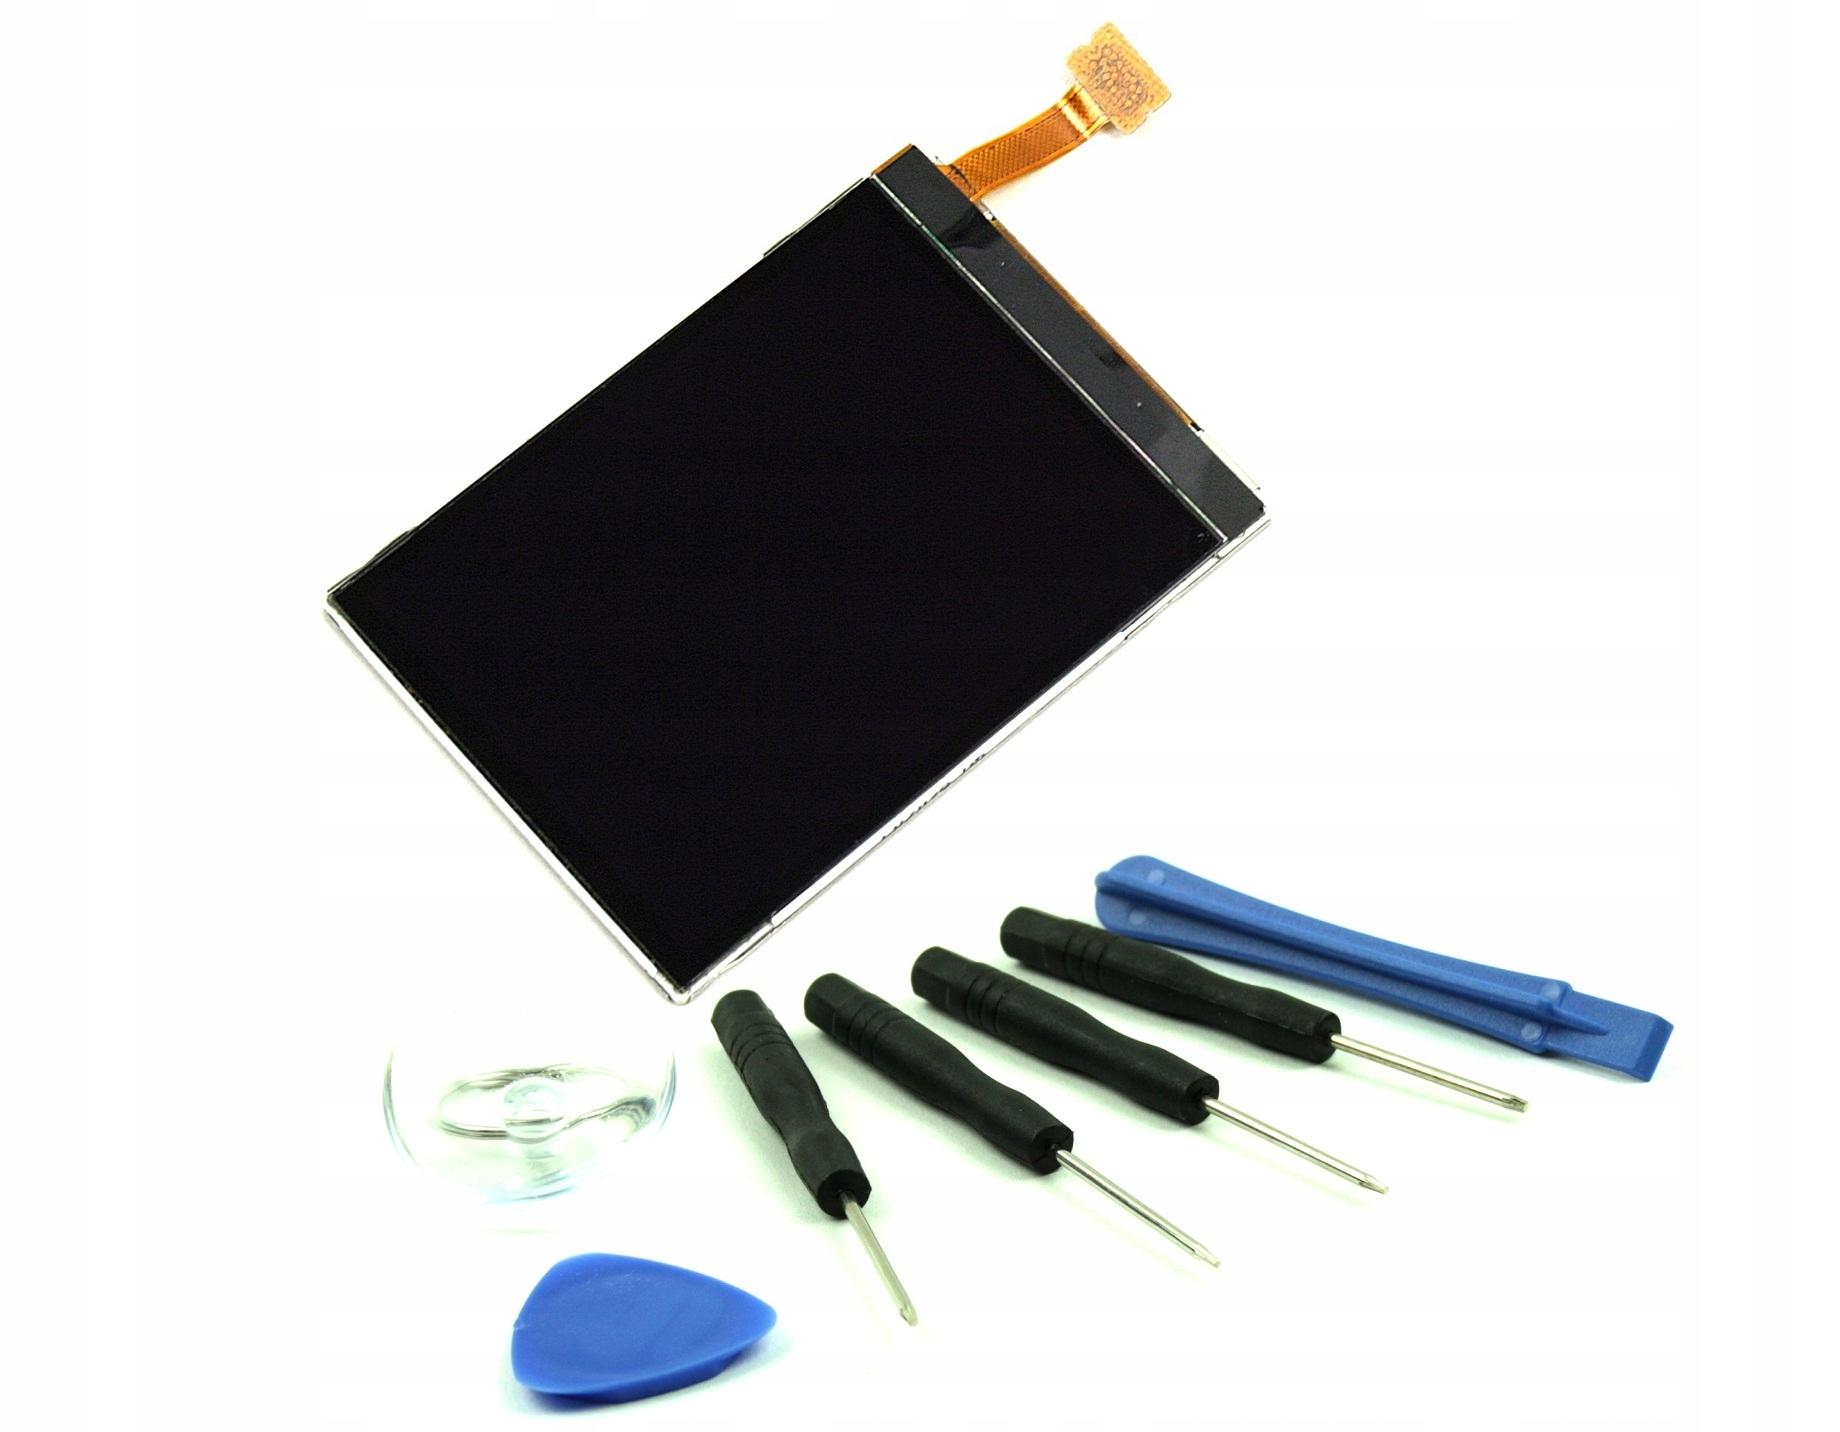 LCD WYŚWIETLACZ NOKIA E66 E52 N82 6210N E75 E55